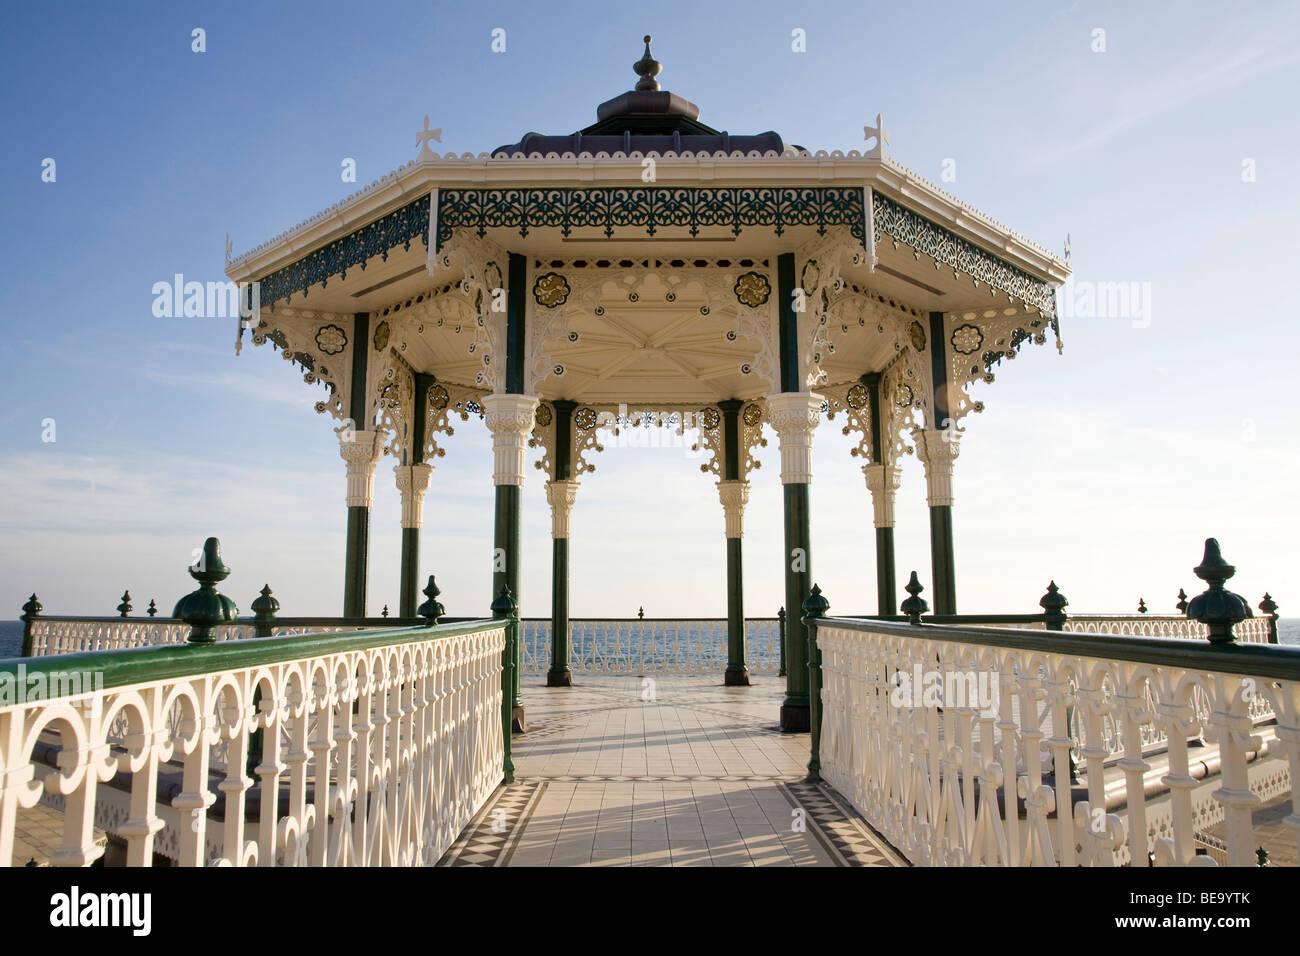 Brighton band stand, newly refurbished. - Stock Image